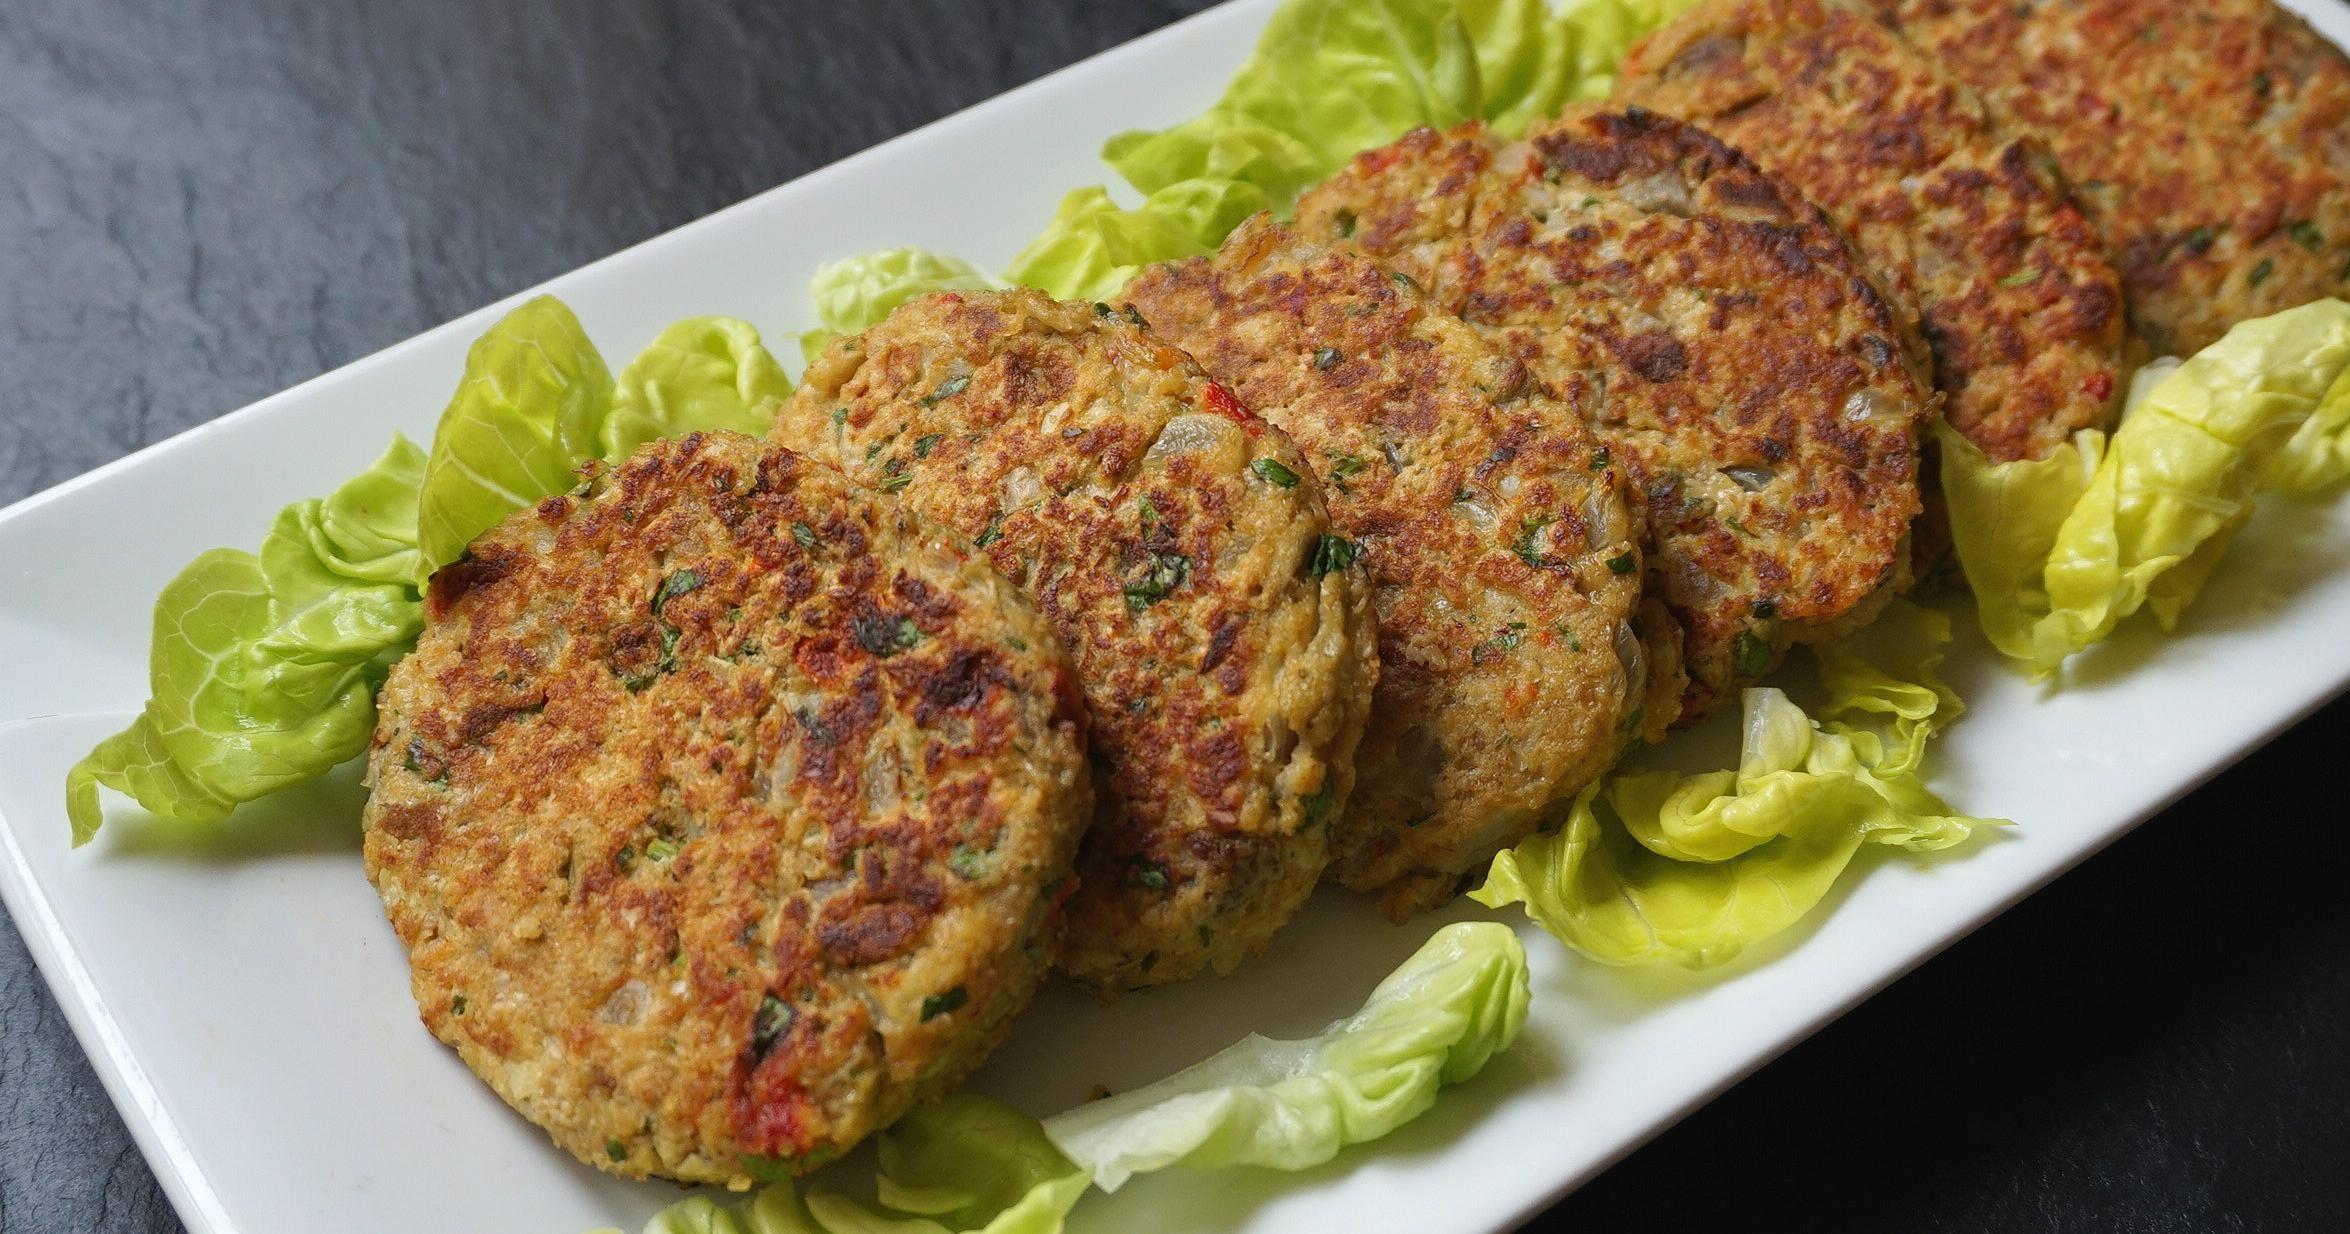 Hamburguesas de berenjena riqu simas y sin grasa - Hacer hamburguesas vegetarianas ...